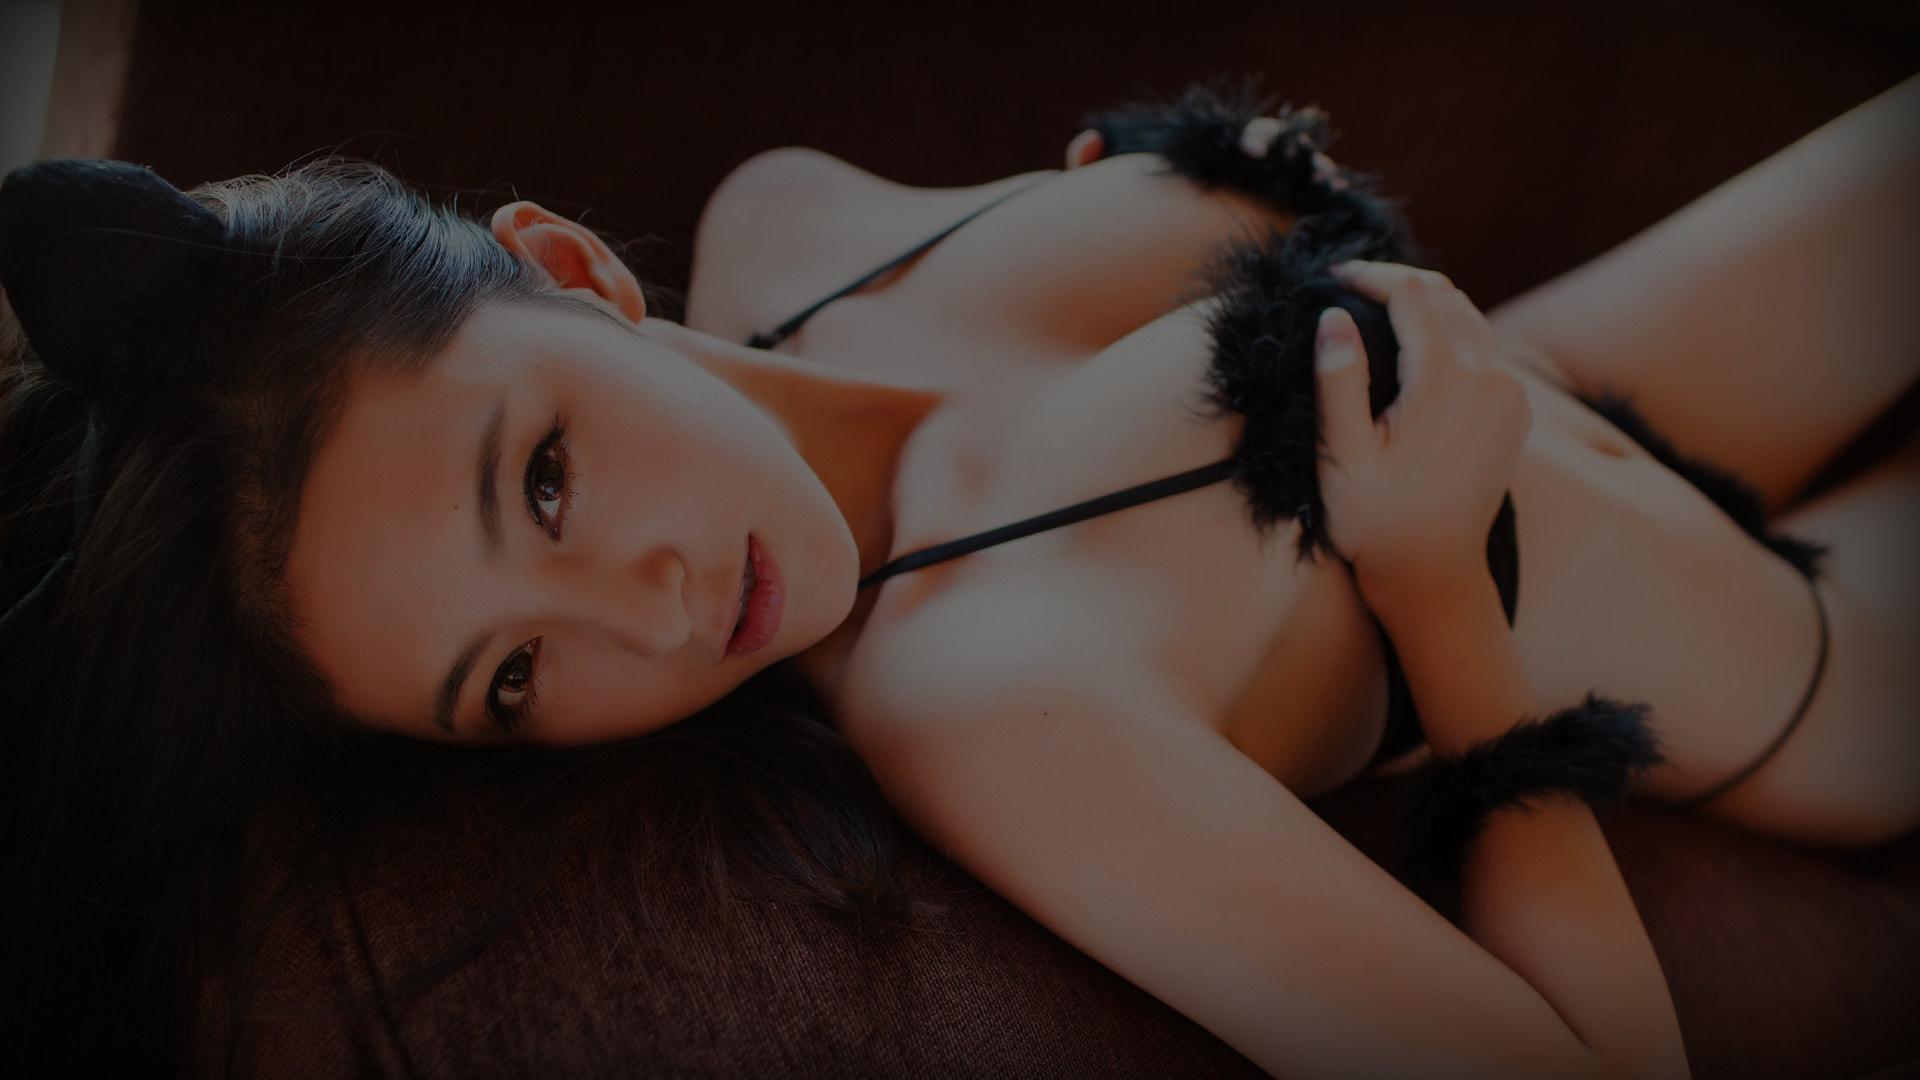 Asian woman in